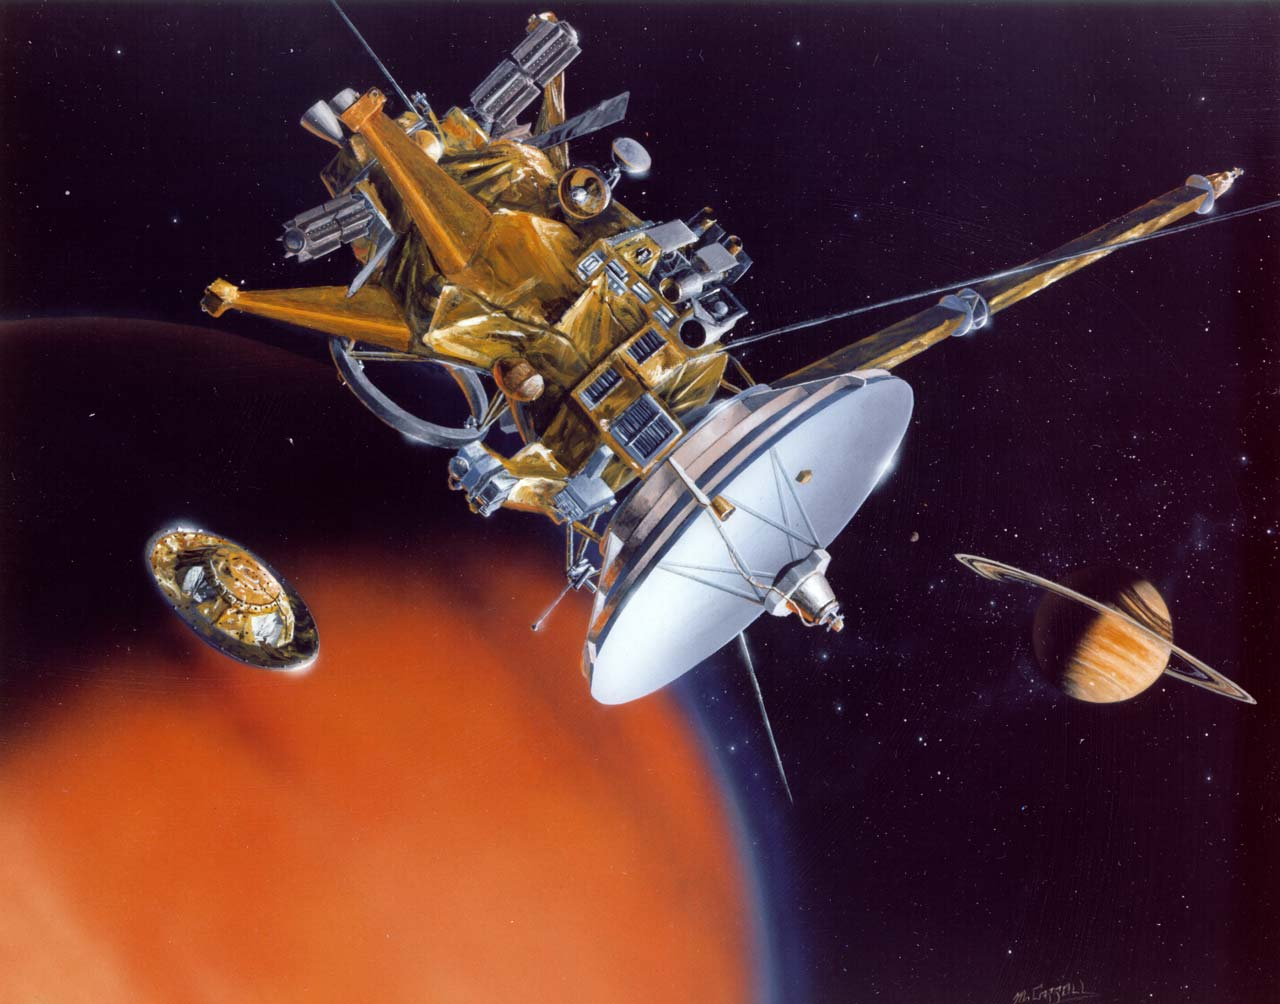 Cassini-Huygens: Exploring Saturn's System